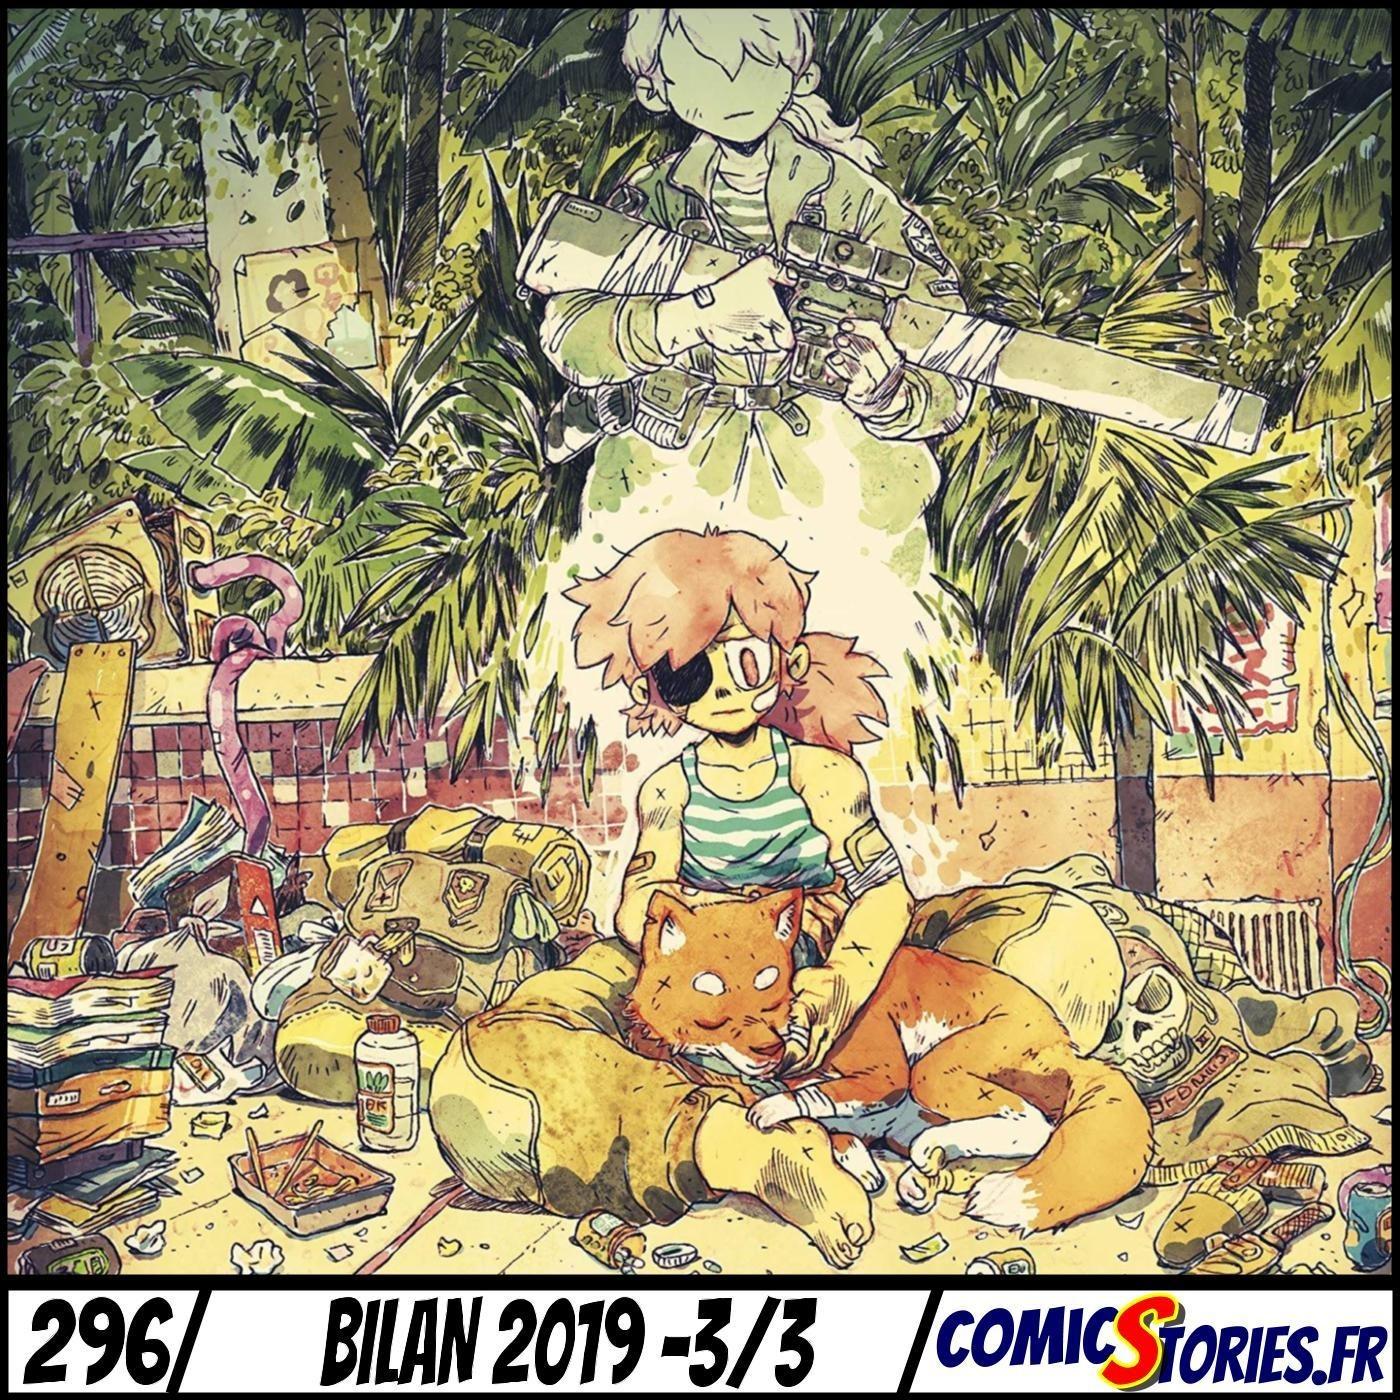 ComicStories #296 - Bilan 2019 (3/3)